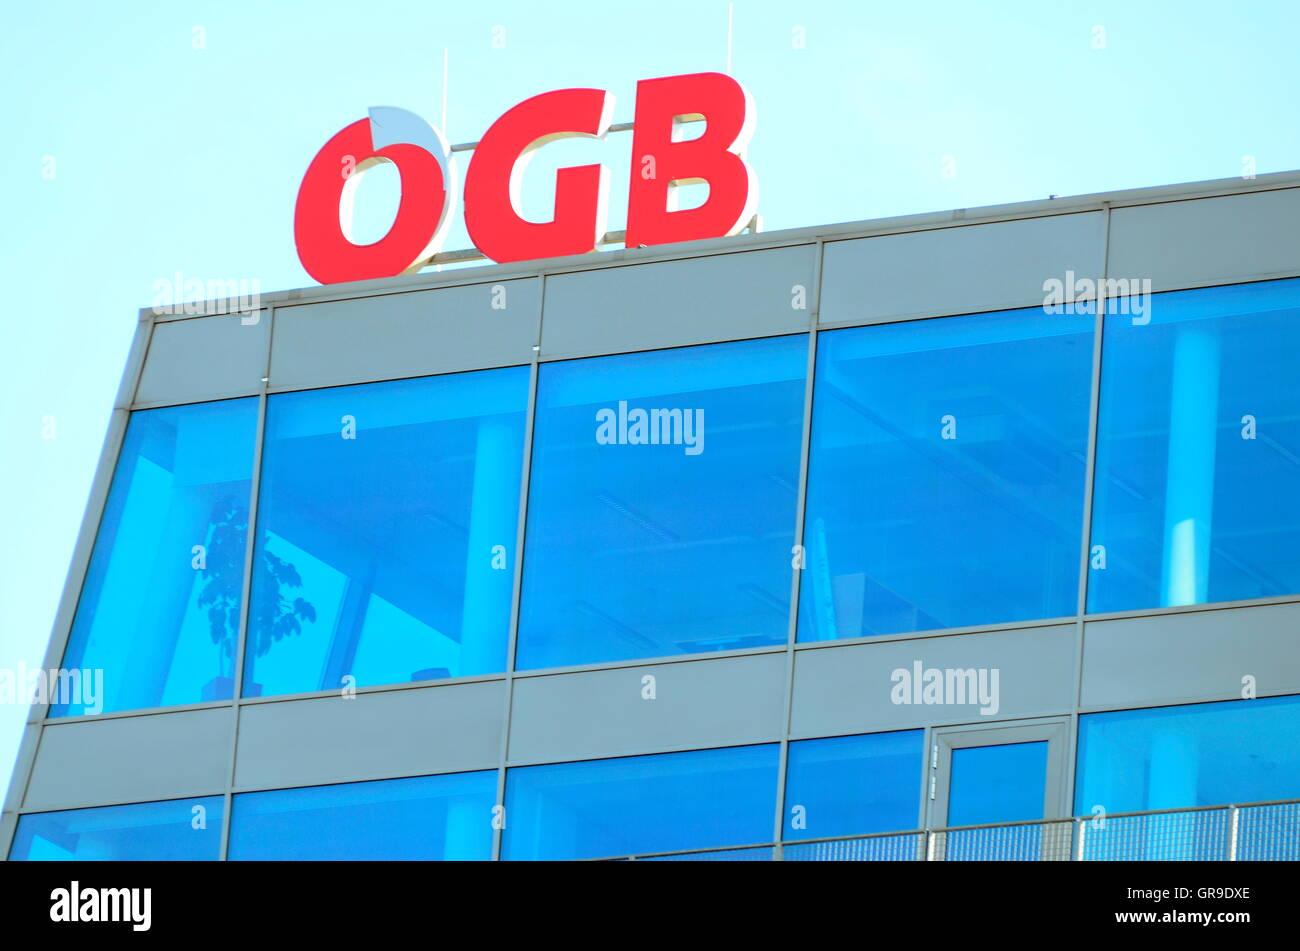 Ögb Austrian Trade Unions Logo - Stock Image